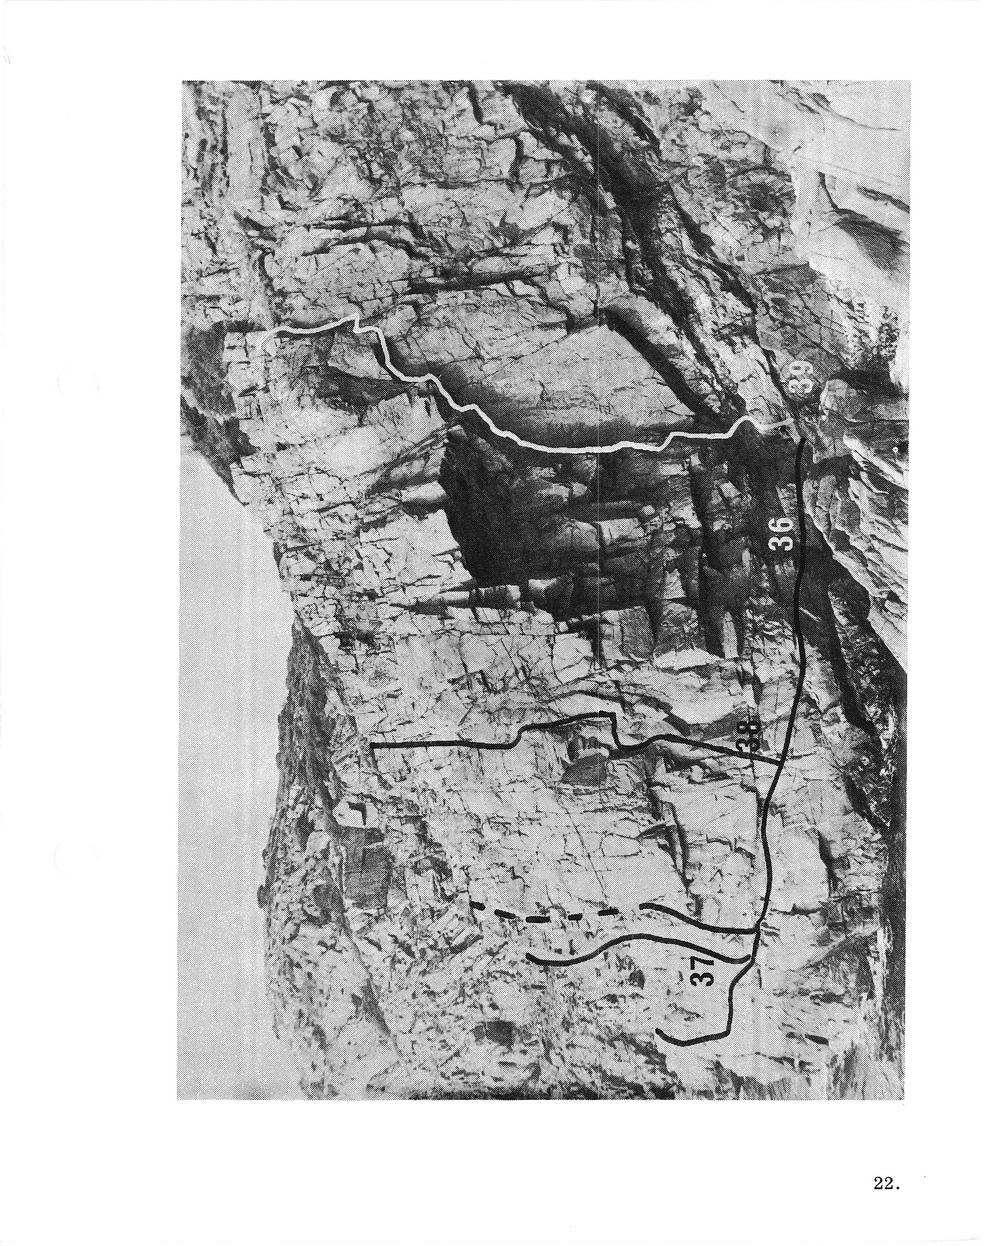 Kullen guide 1972 022.jpg